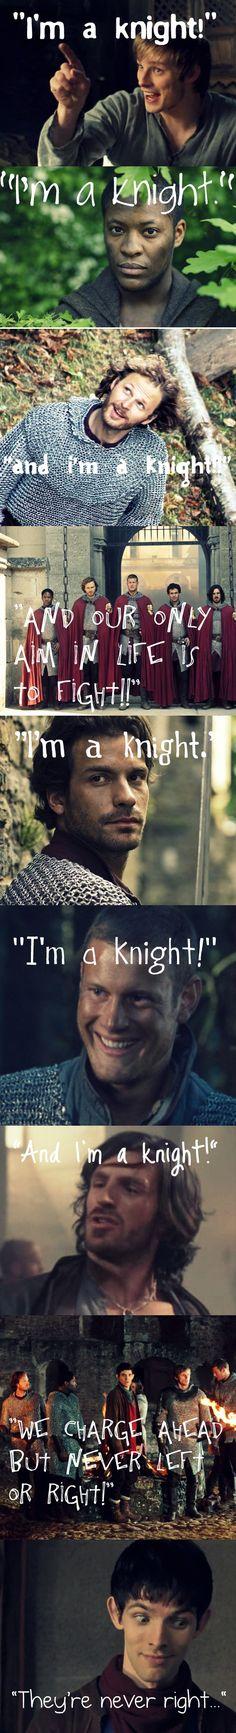 I'm a Knight - Merlin Style Threeeeee by MerlinLemon.deviantart.com on @deviantART